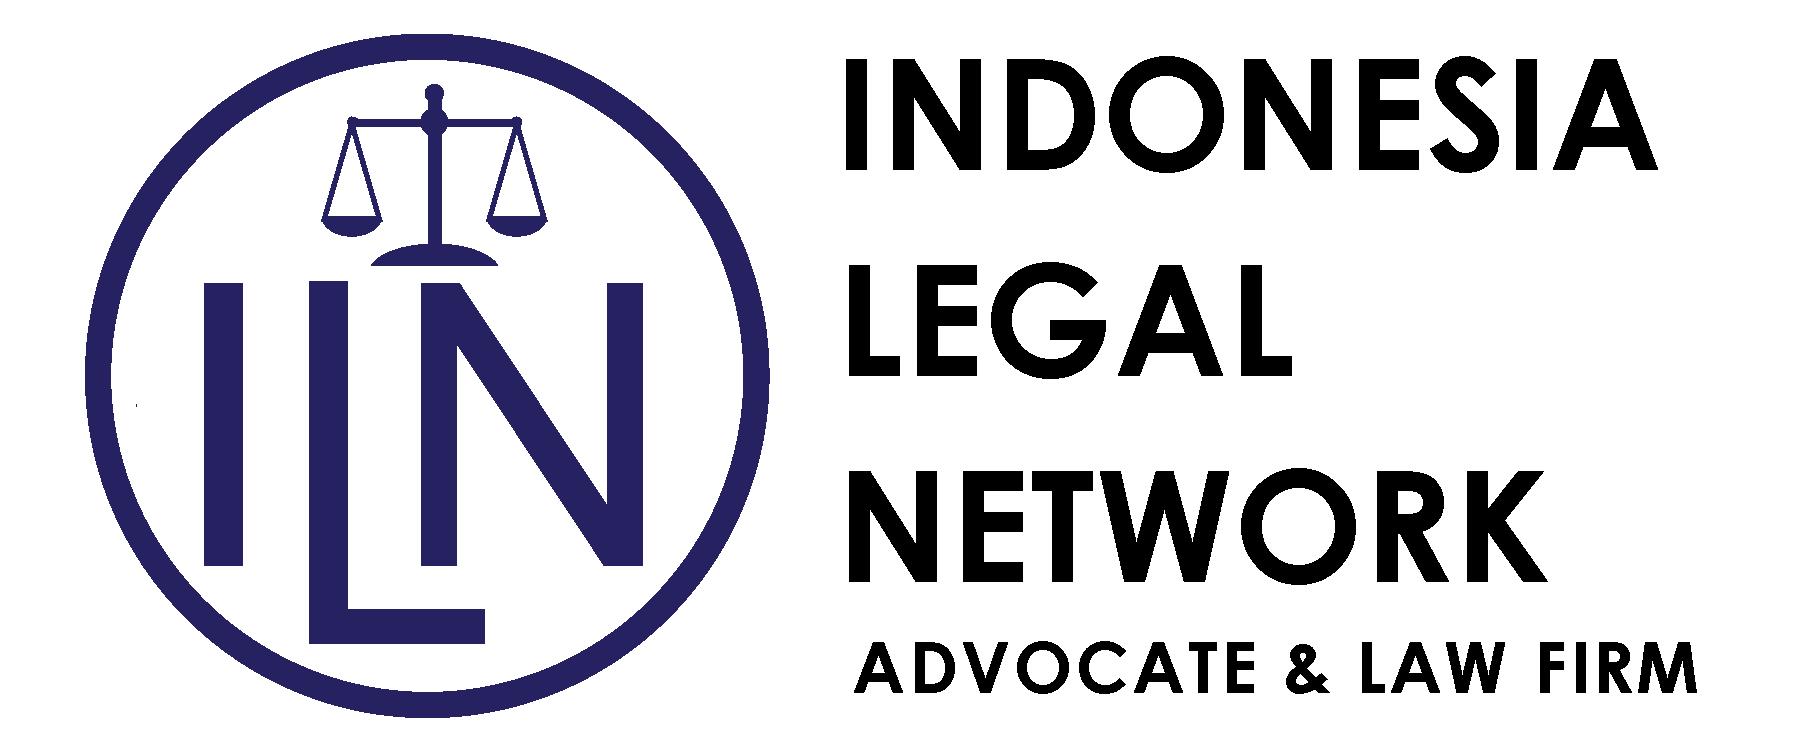 Indonesia Legal Network - Hukum Properti